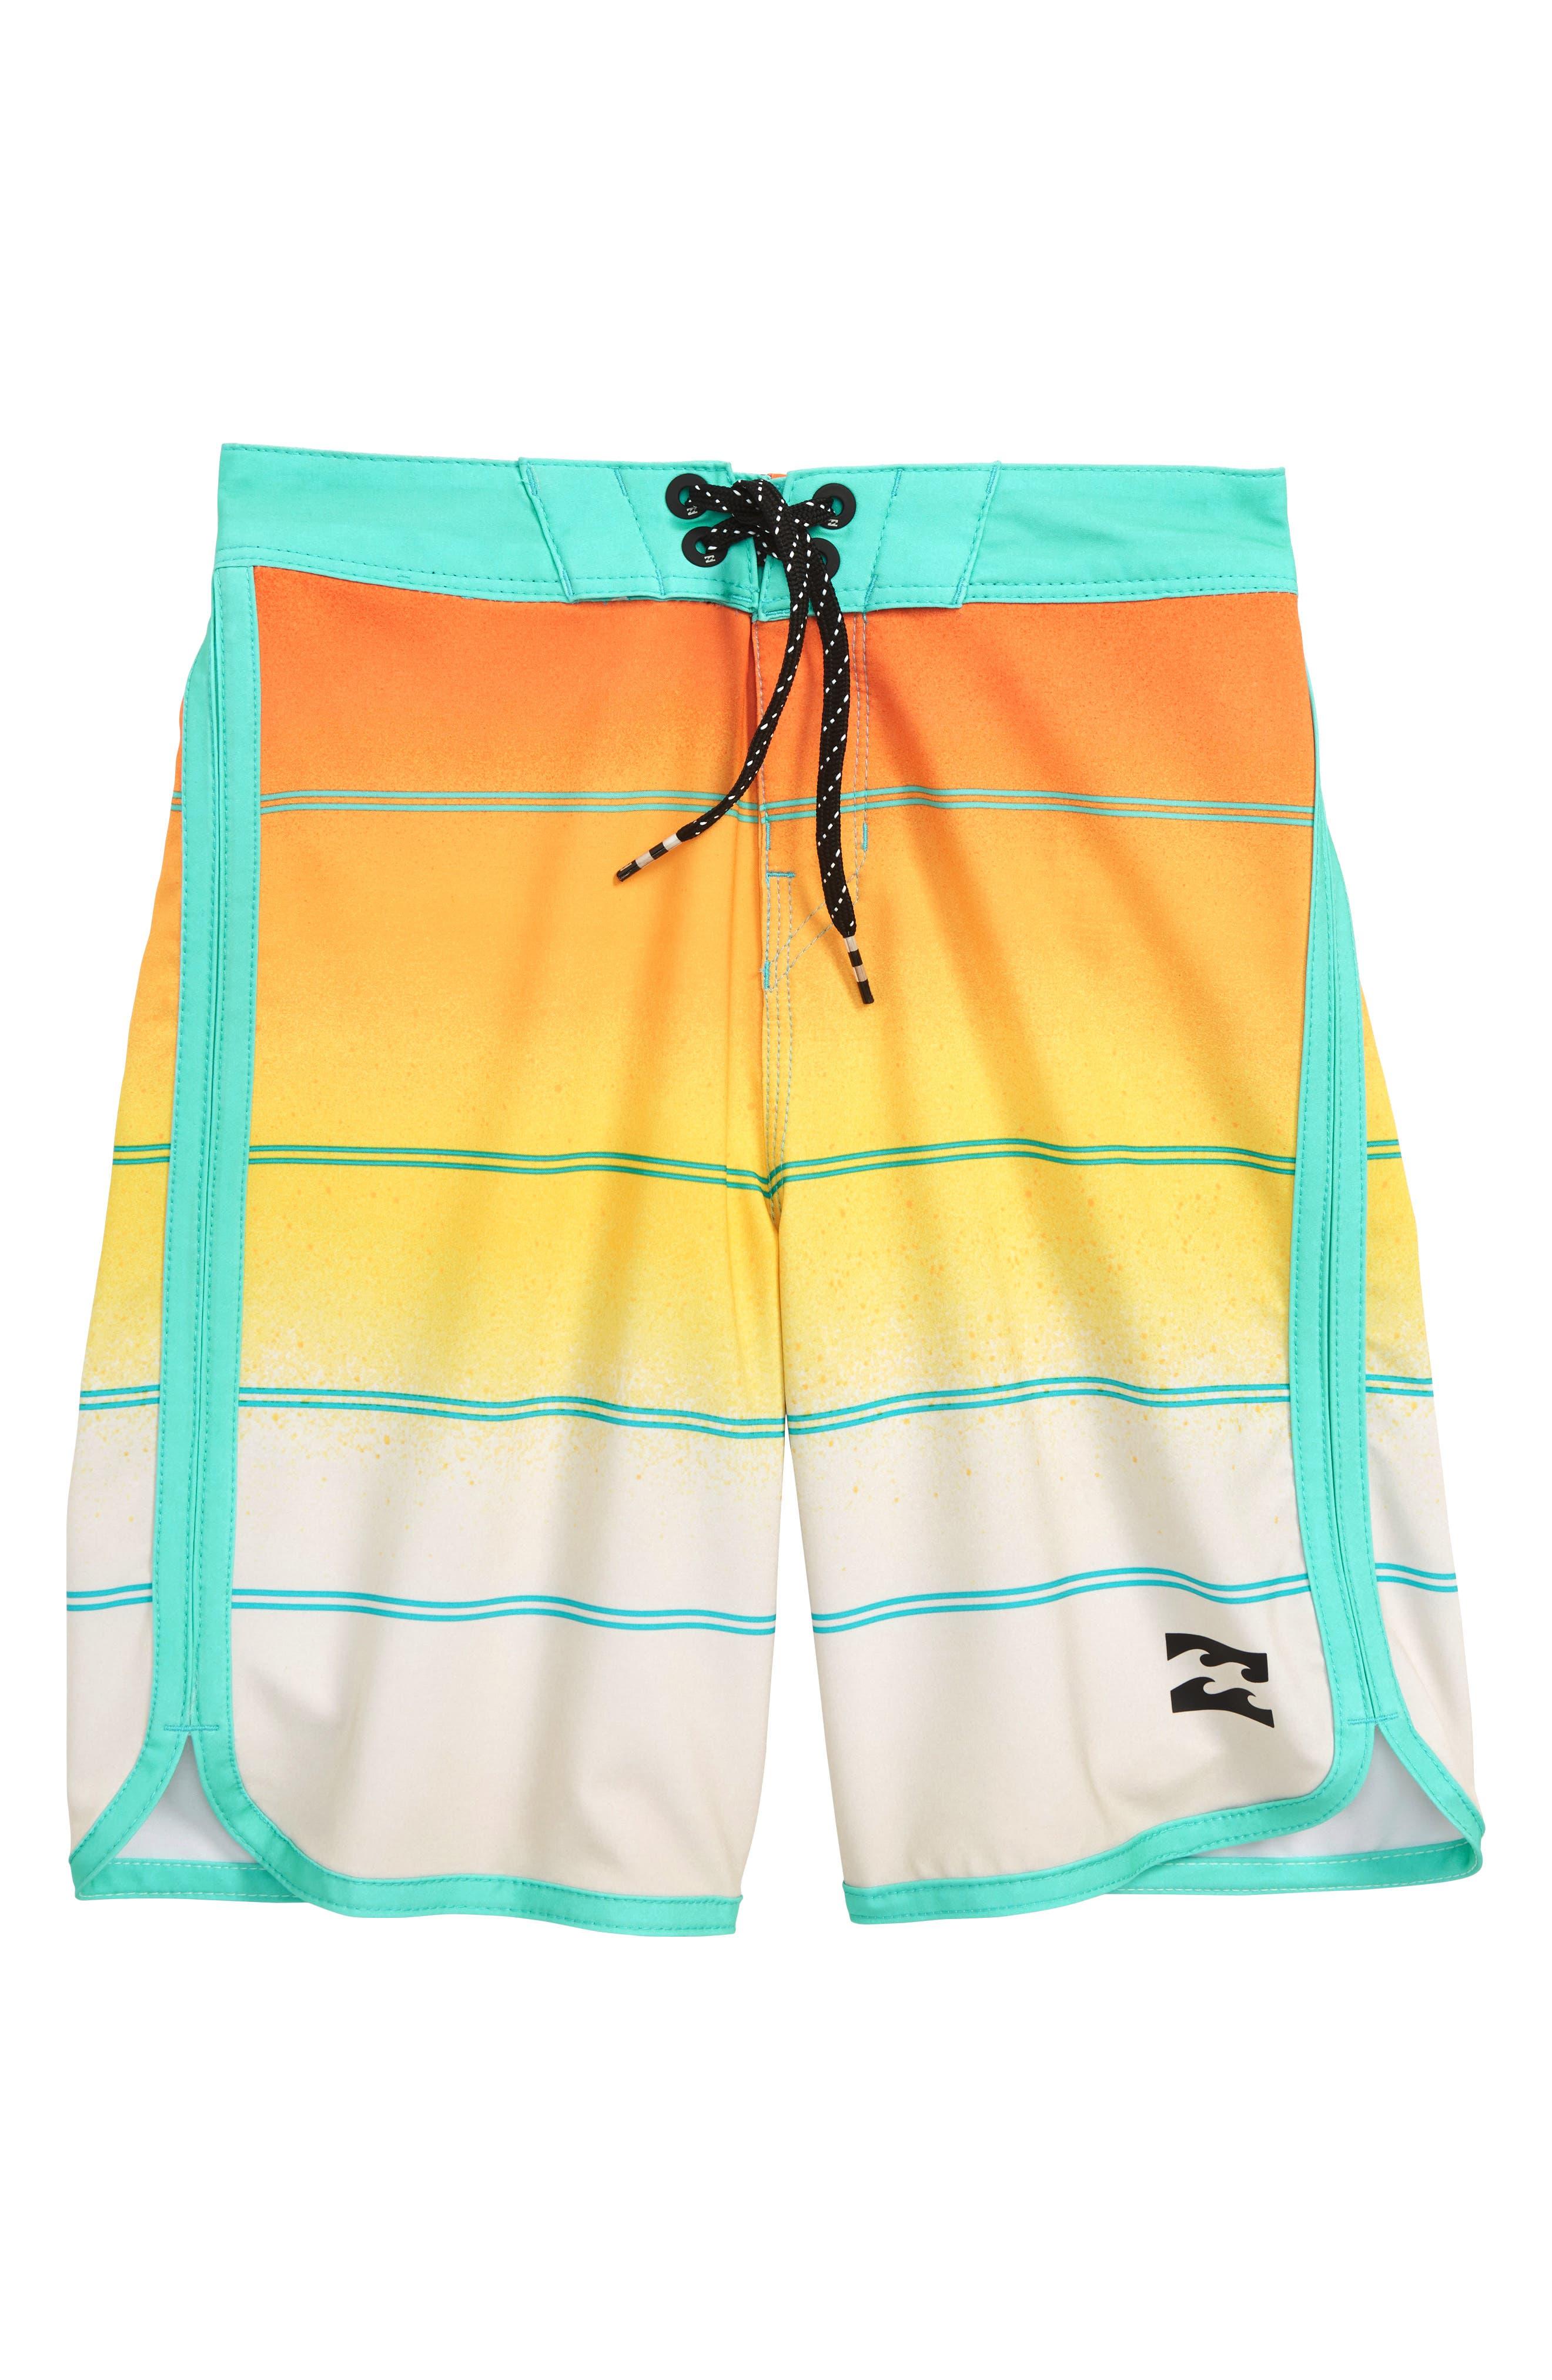 73 X Stripe Board Shorts,                             Main thumbnail 1, color,                             Yellow